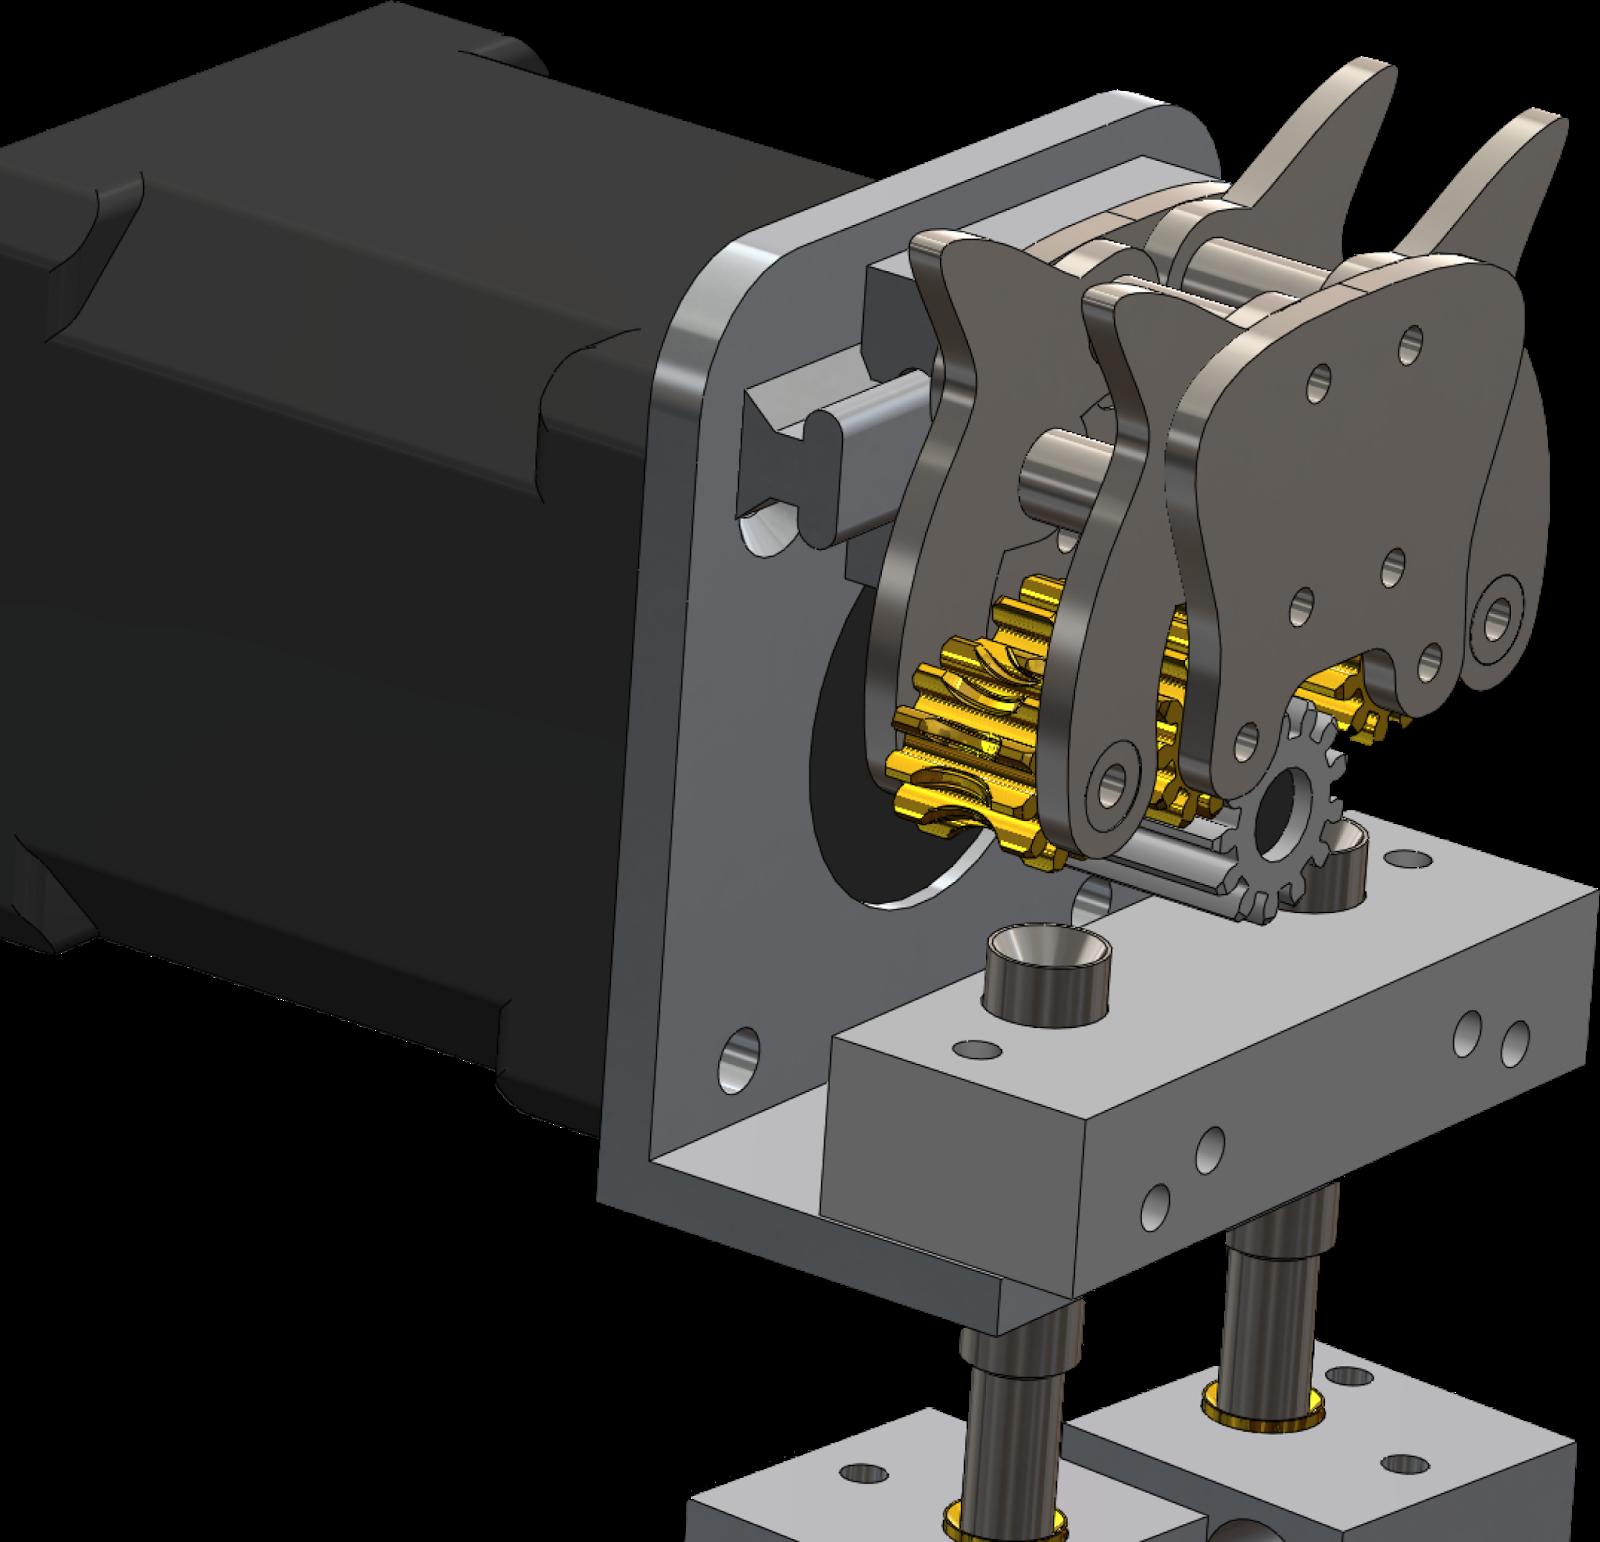 DIY 3D Printing: D3D Extruder